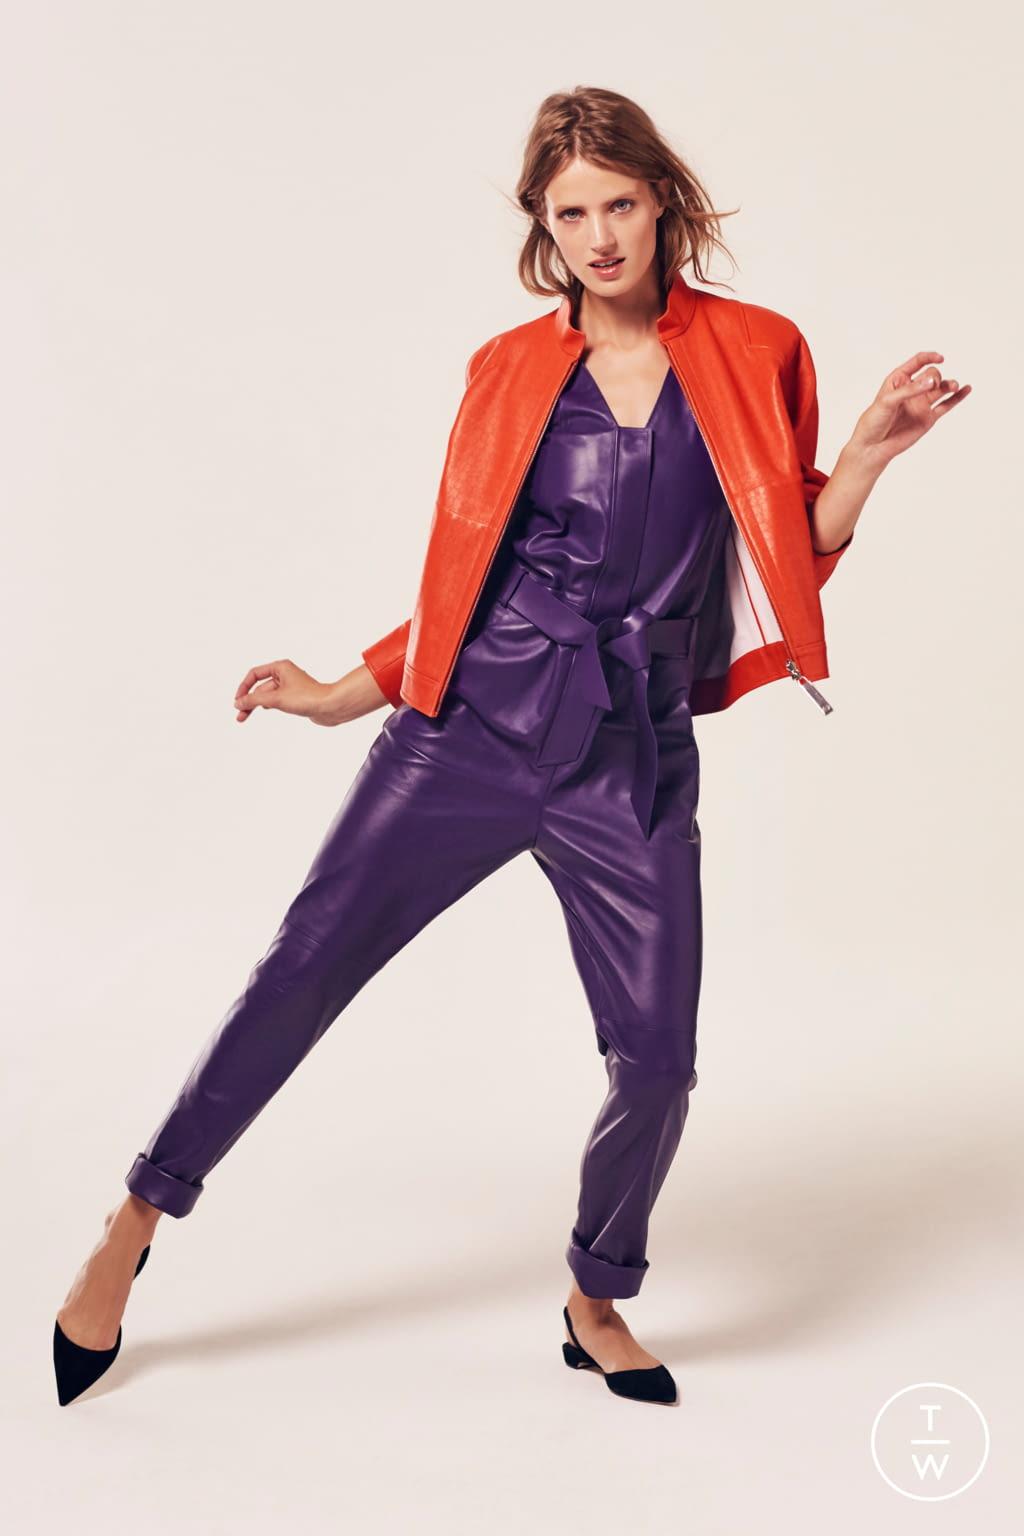 Fashion Week Paris Spring/Summer 2018 look 28 de la collection Maison Ullens womenswear